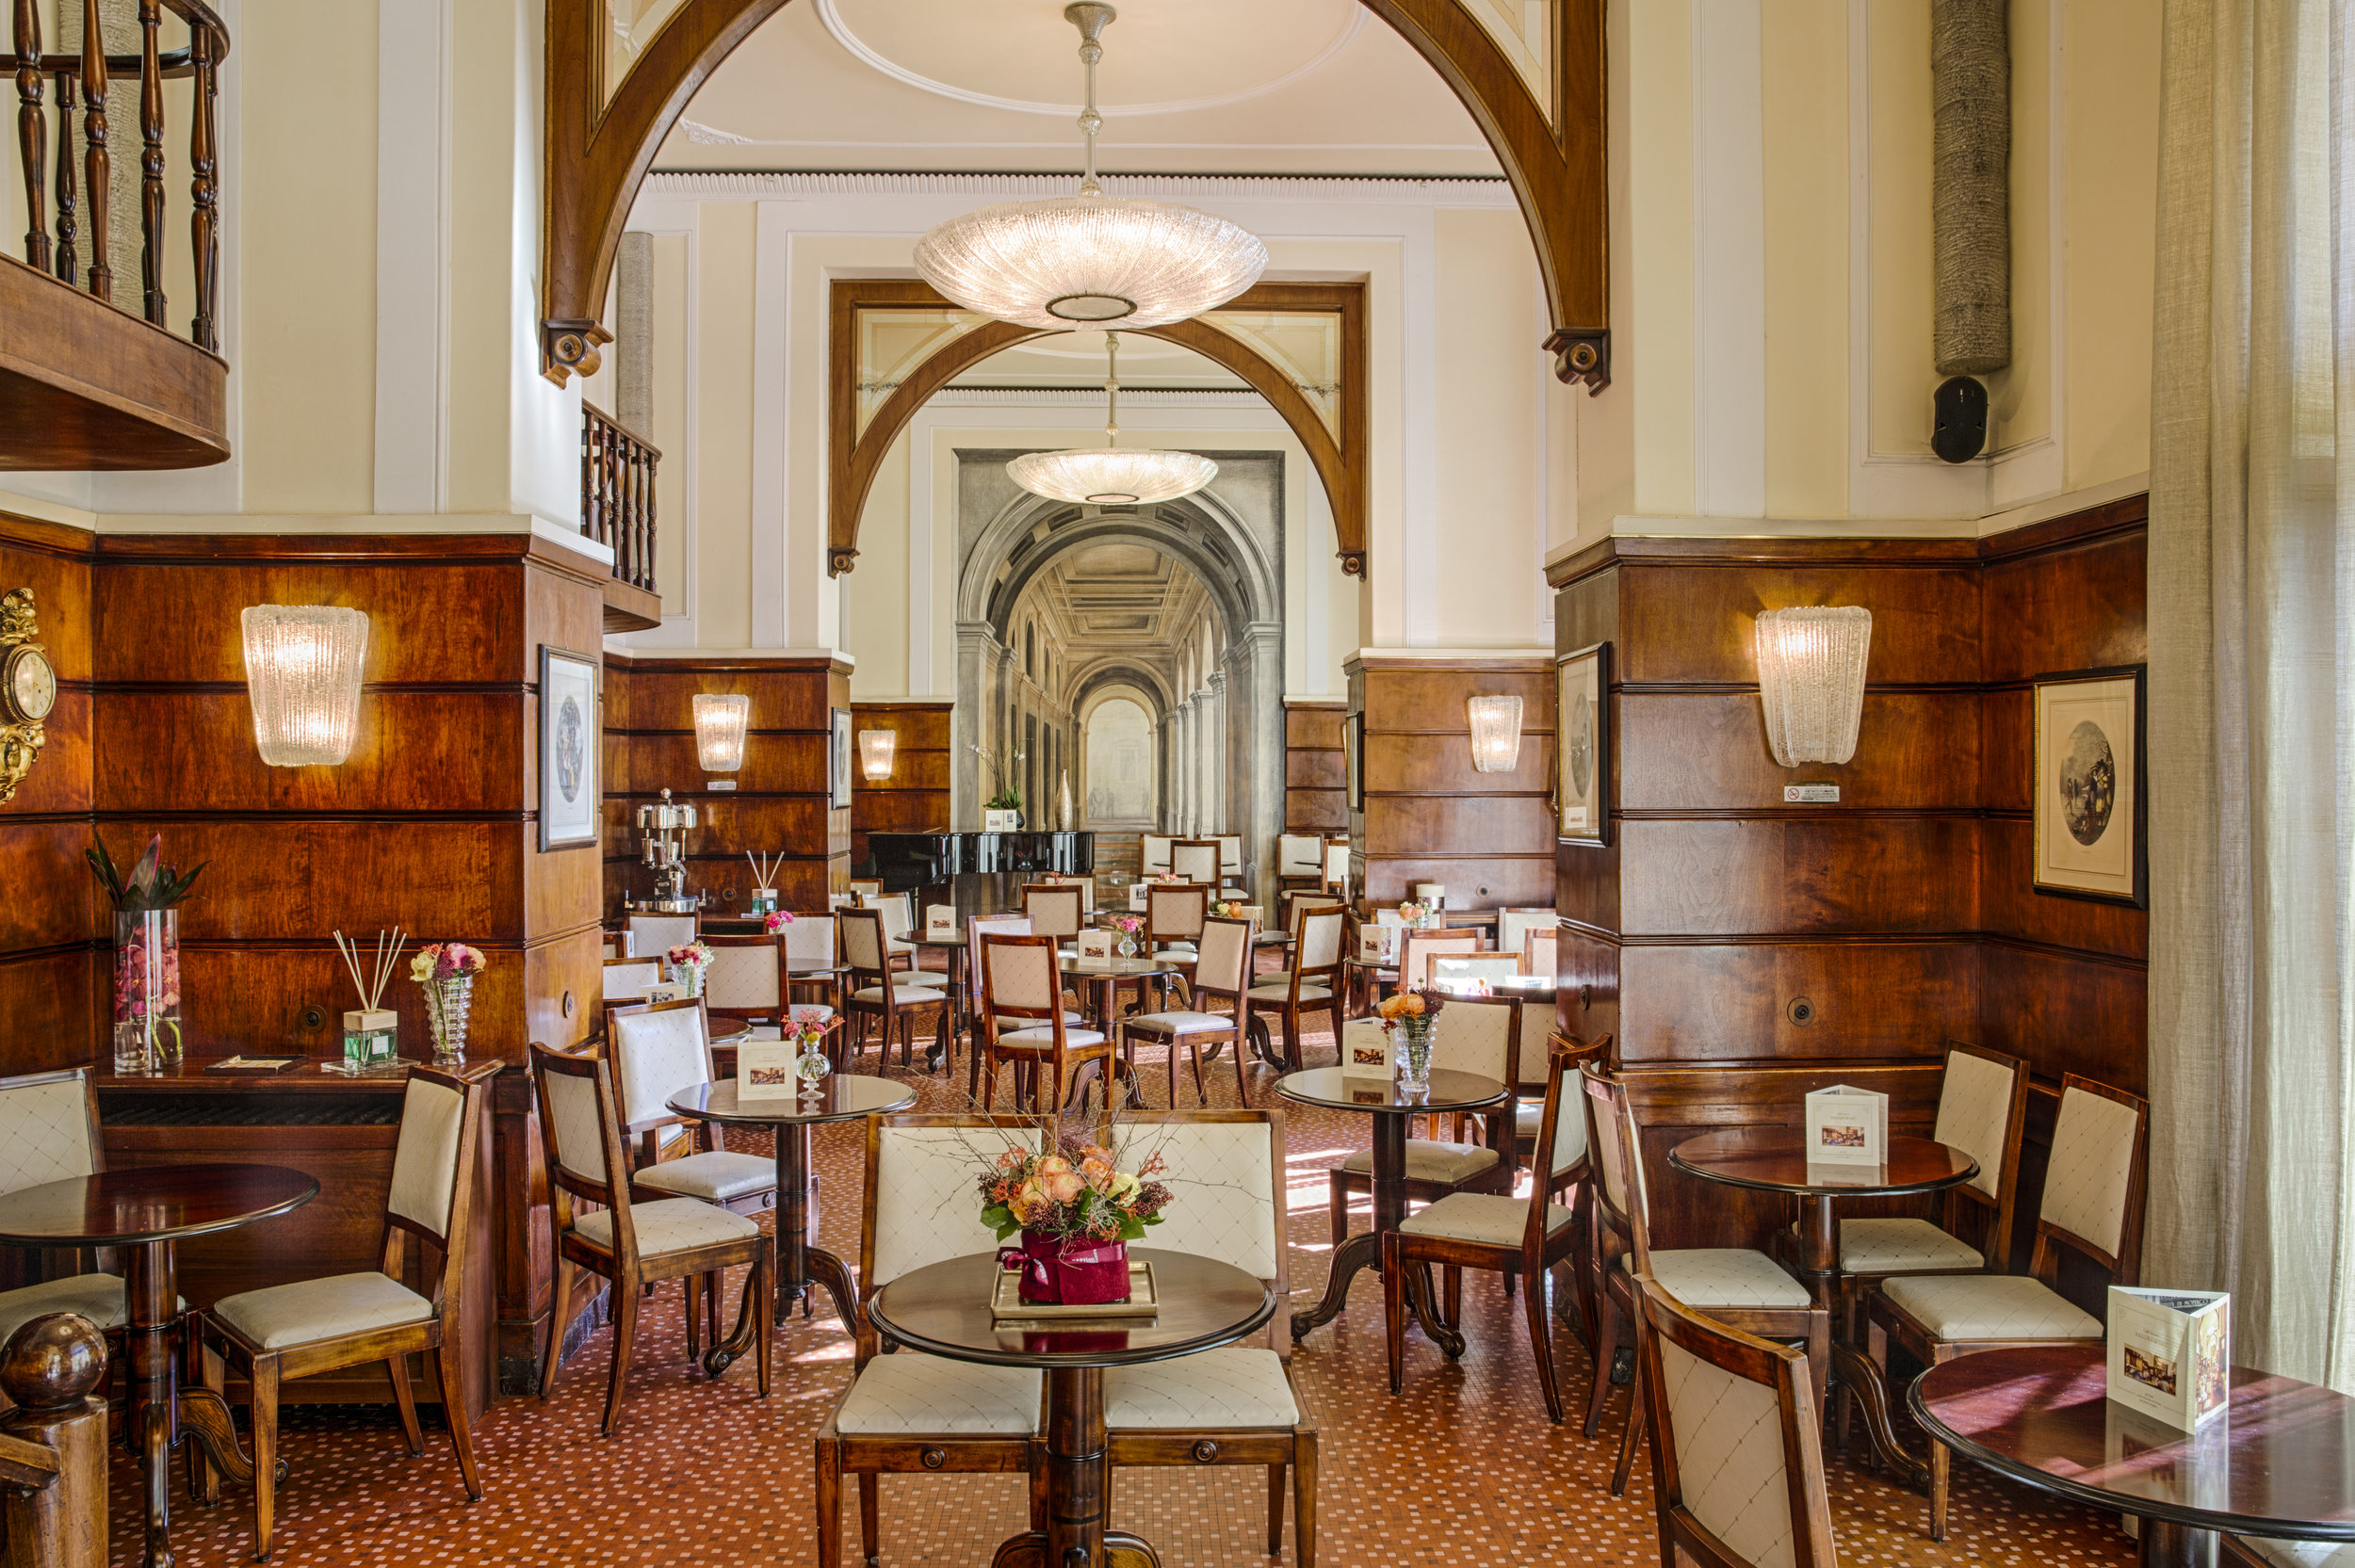 The restaurant hall